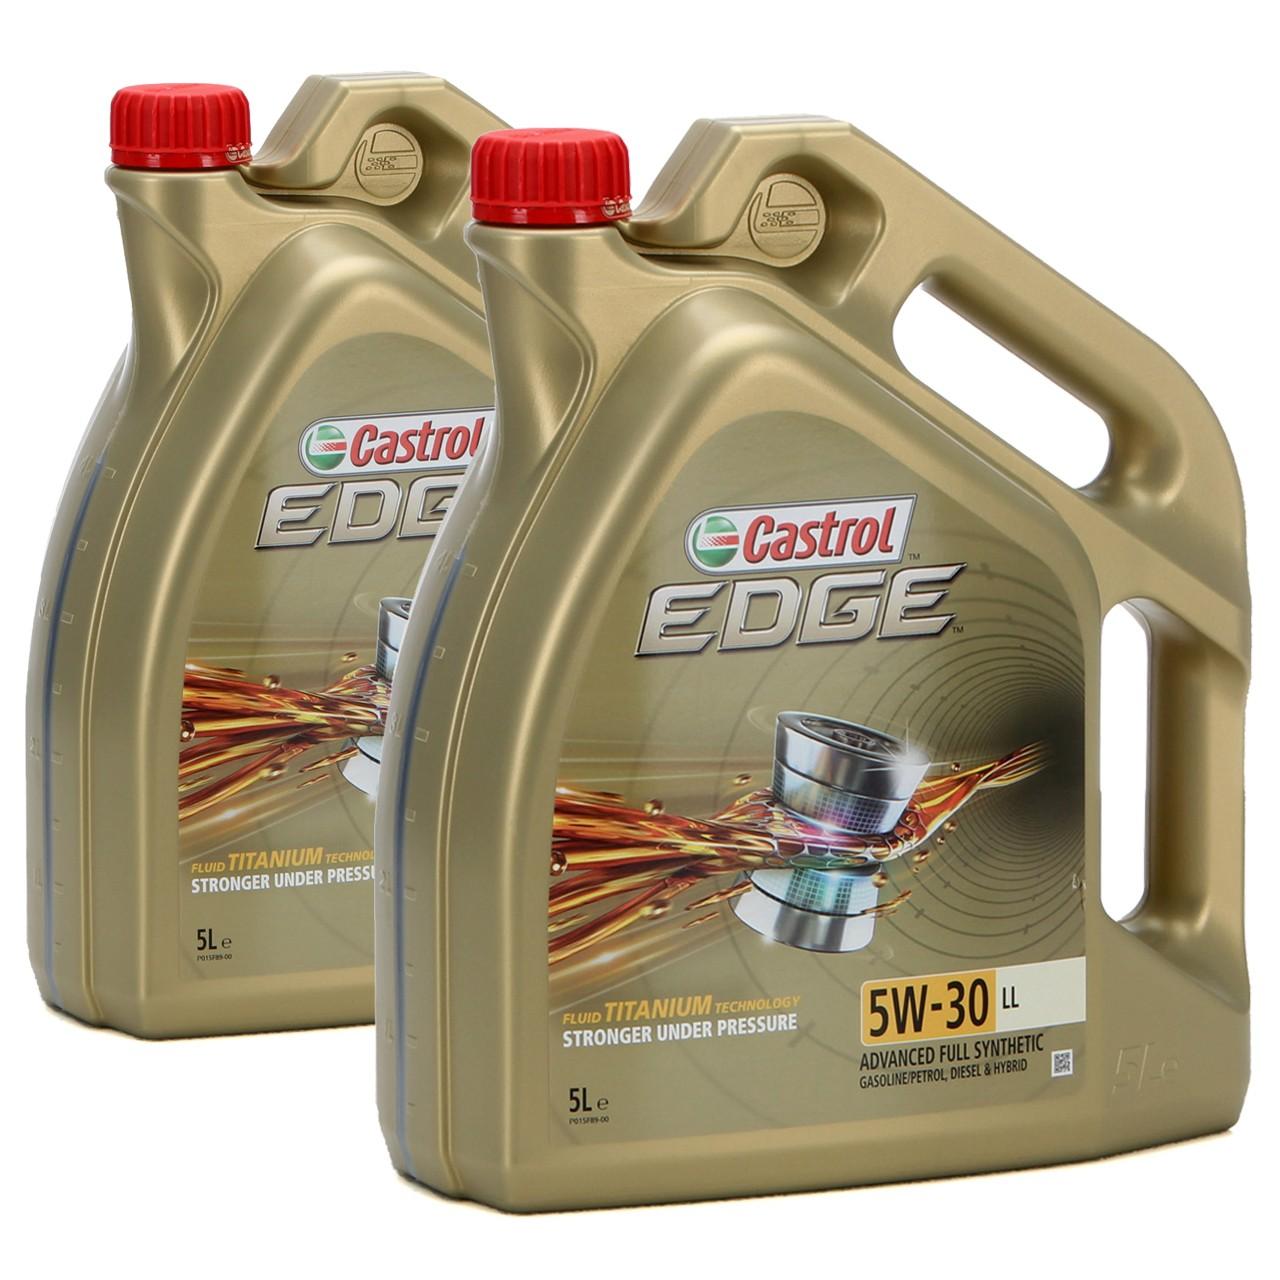 CASTROL EDGE Motoröl ÖL TITANIUM 5W30 LL ACEA C3 VW 504.00/507.00 - 10L 10 Liter